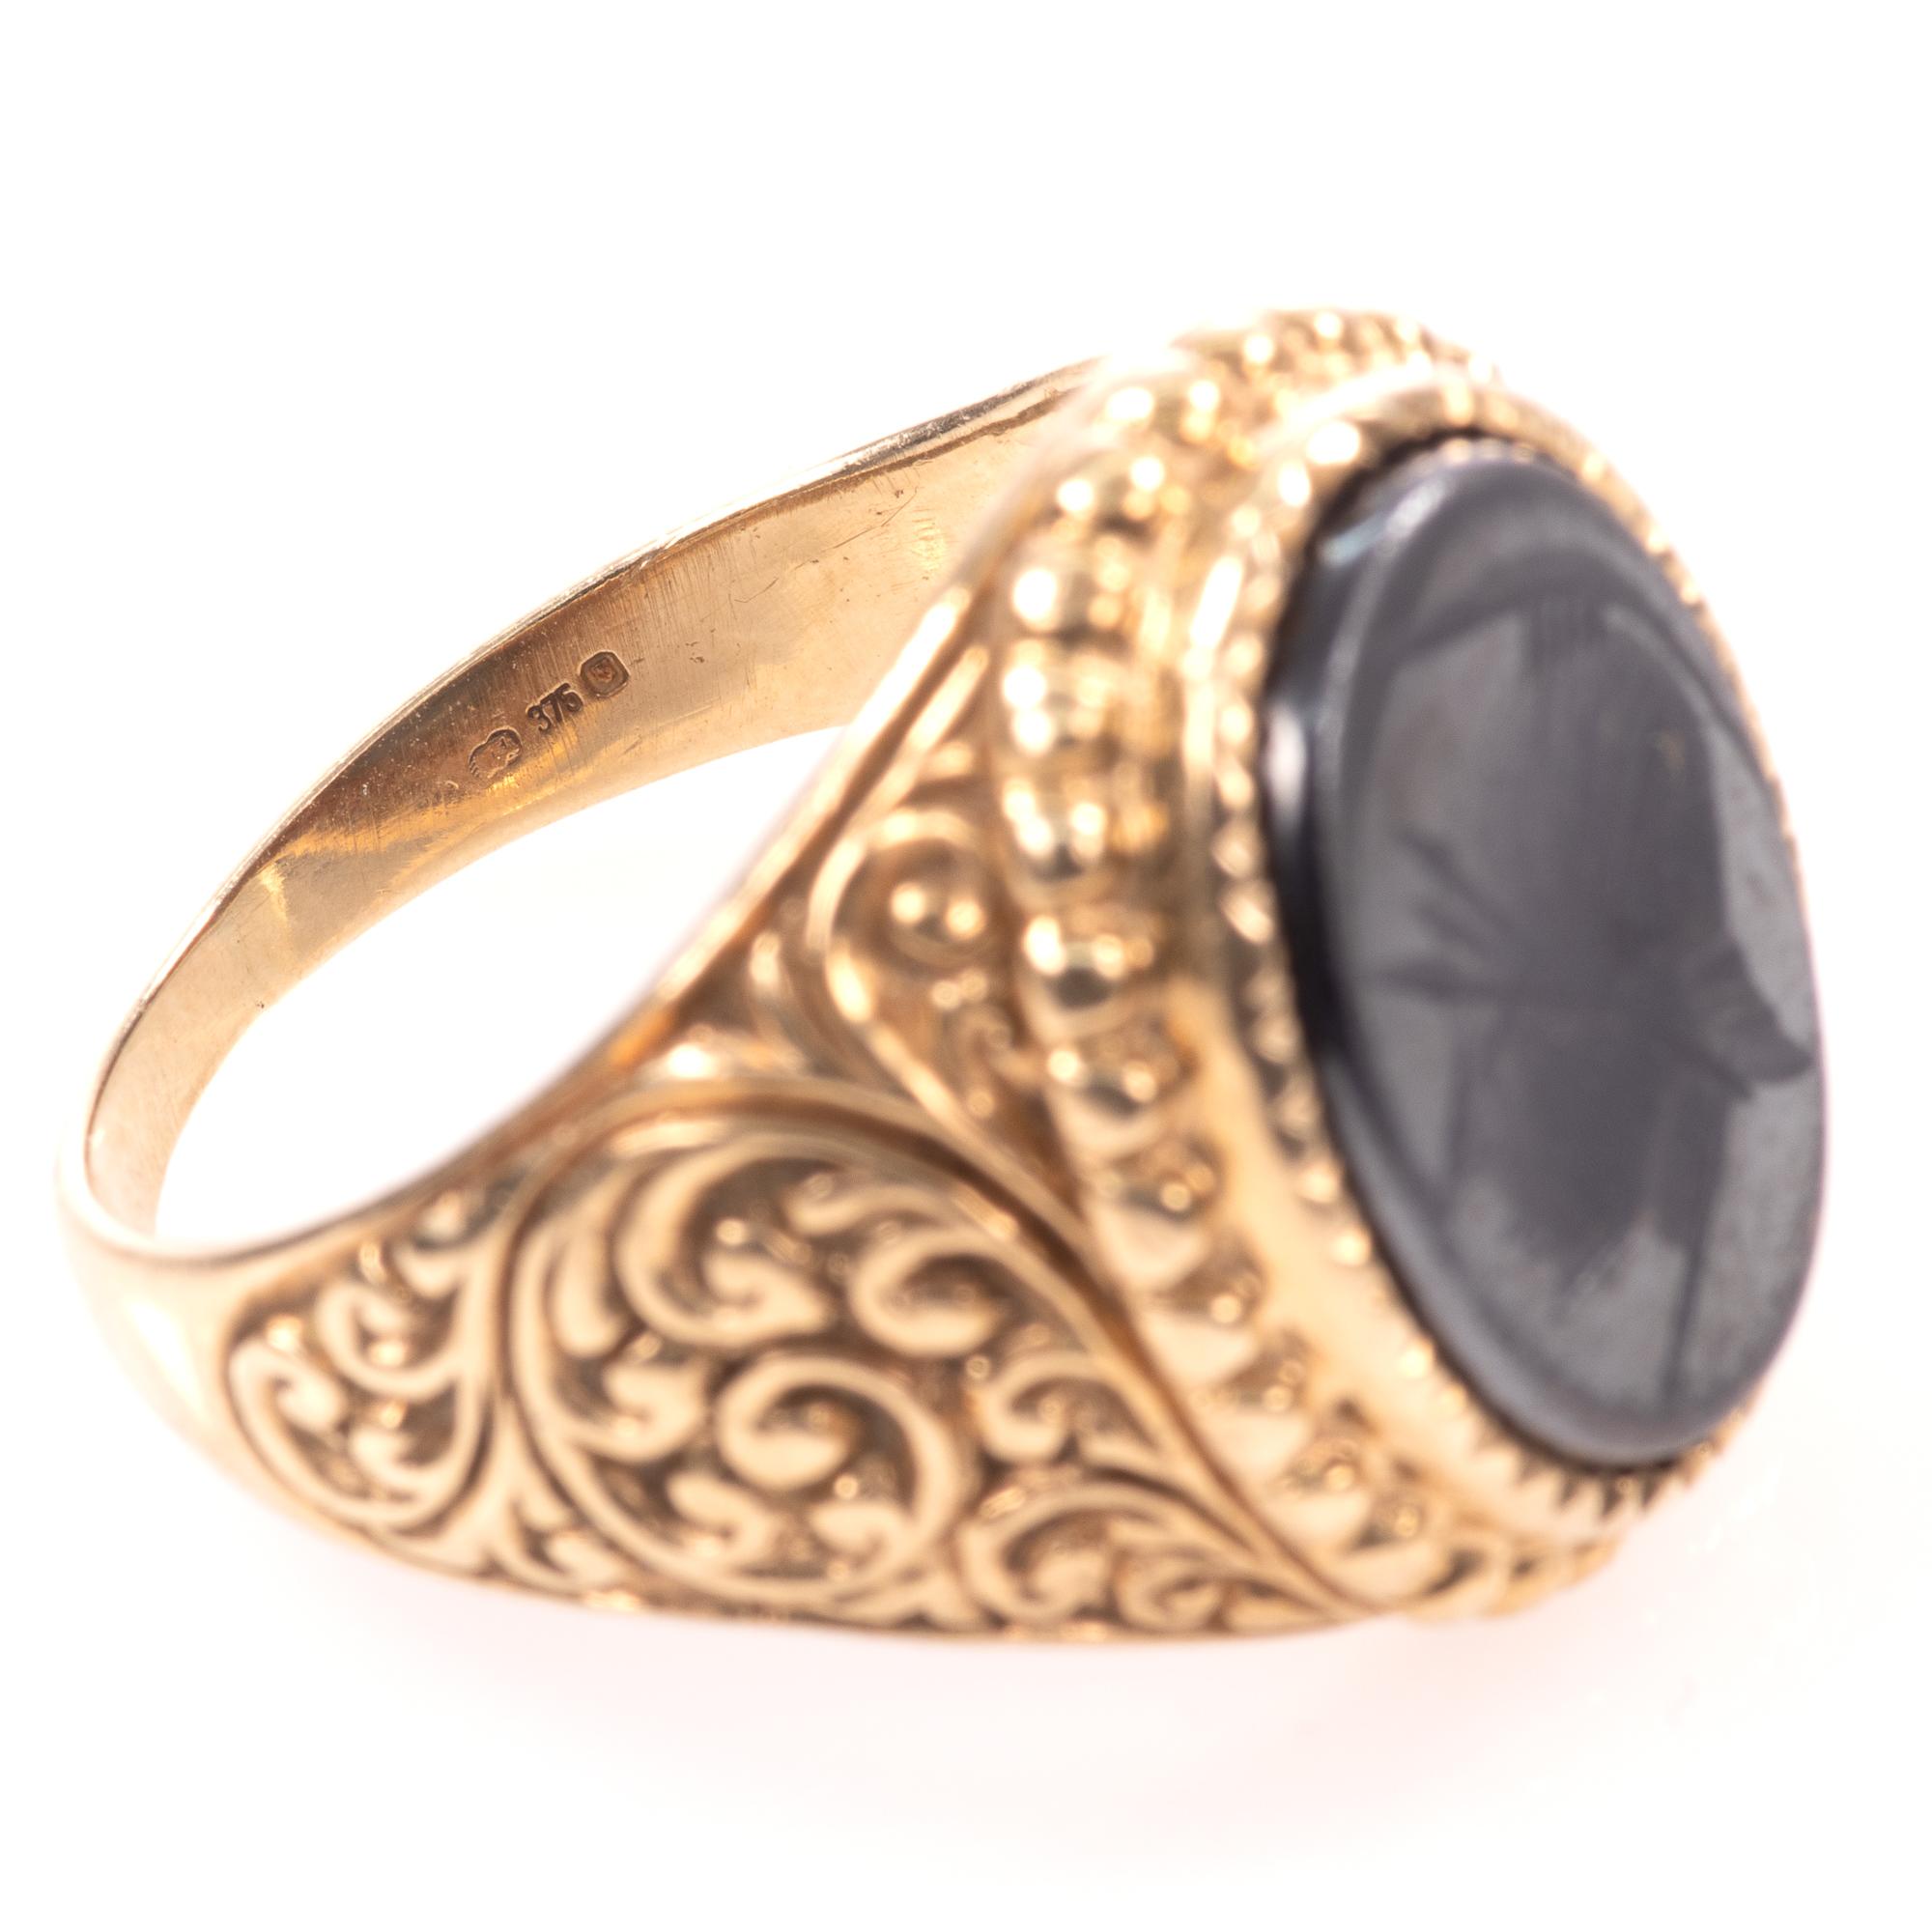 9ct Gold Centurion Onyx Signet Ring - Image 7 of 7